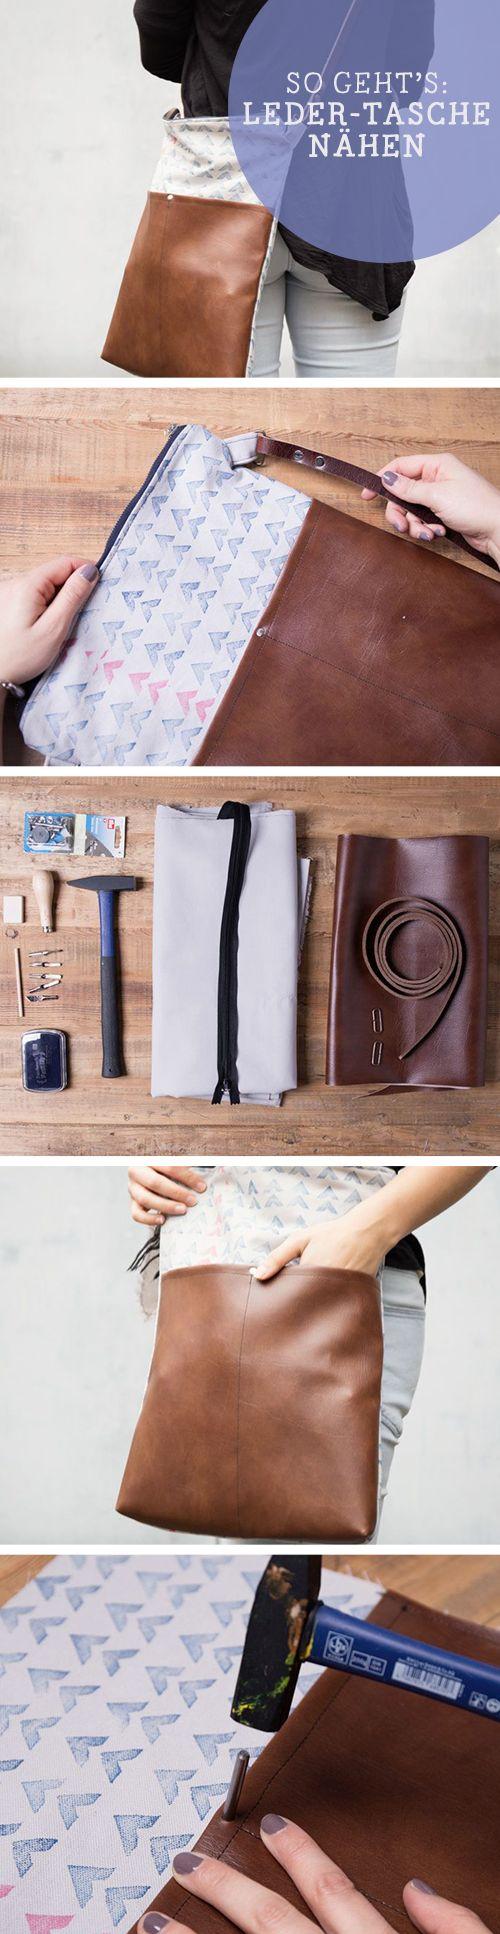 Kostenlose Anleitung: Ledertasche nähen und bedrucken, Trend / trendy and free diy tutorial: sew your own leather bag, printed via DaWanda.com